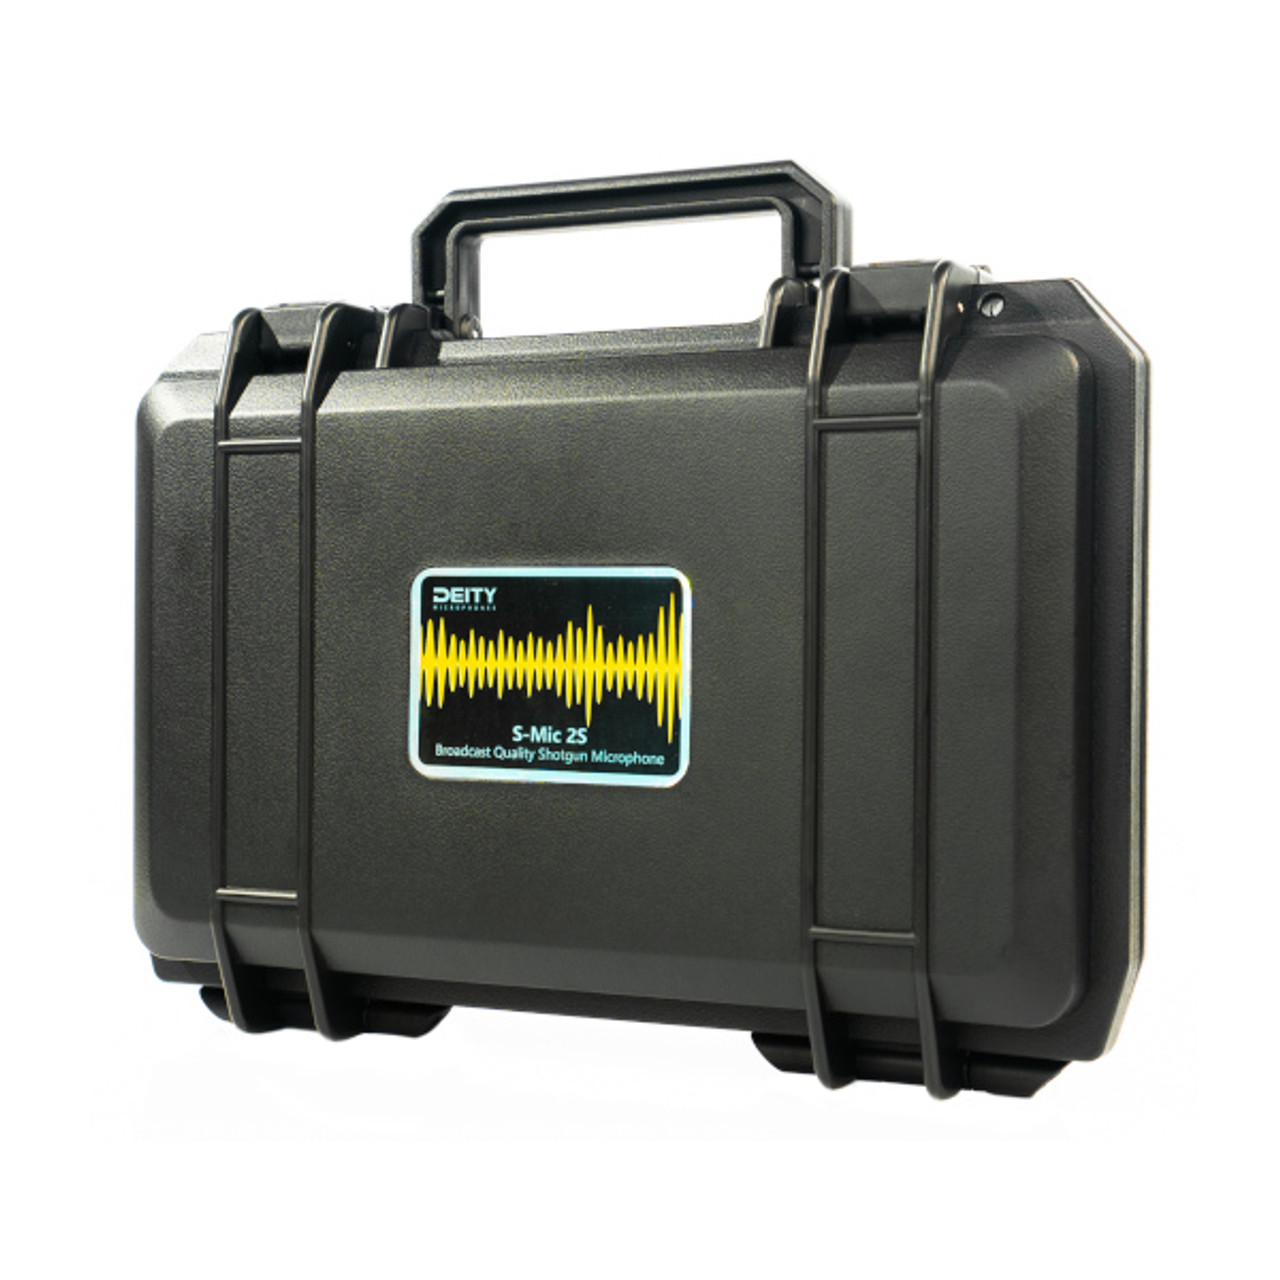 Deity S-Mic 2 Location Kit